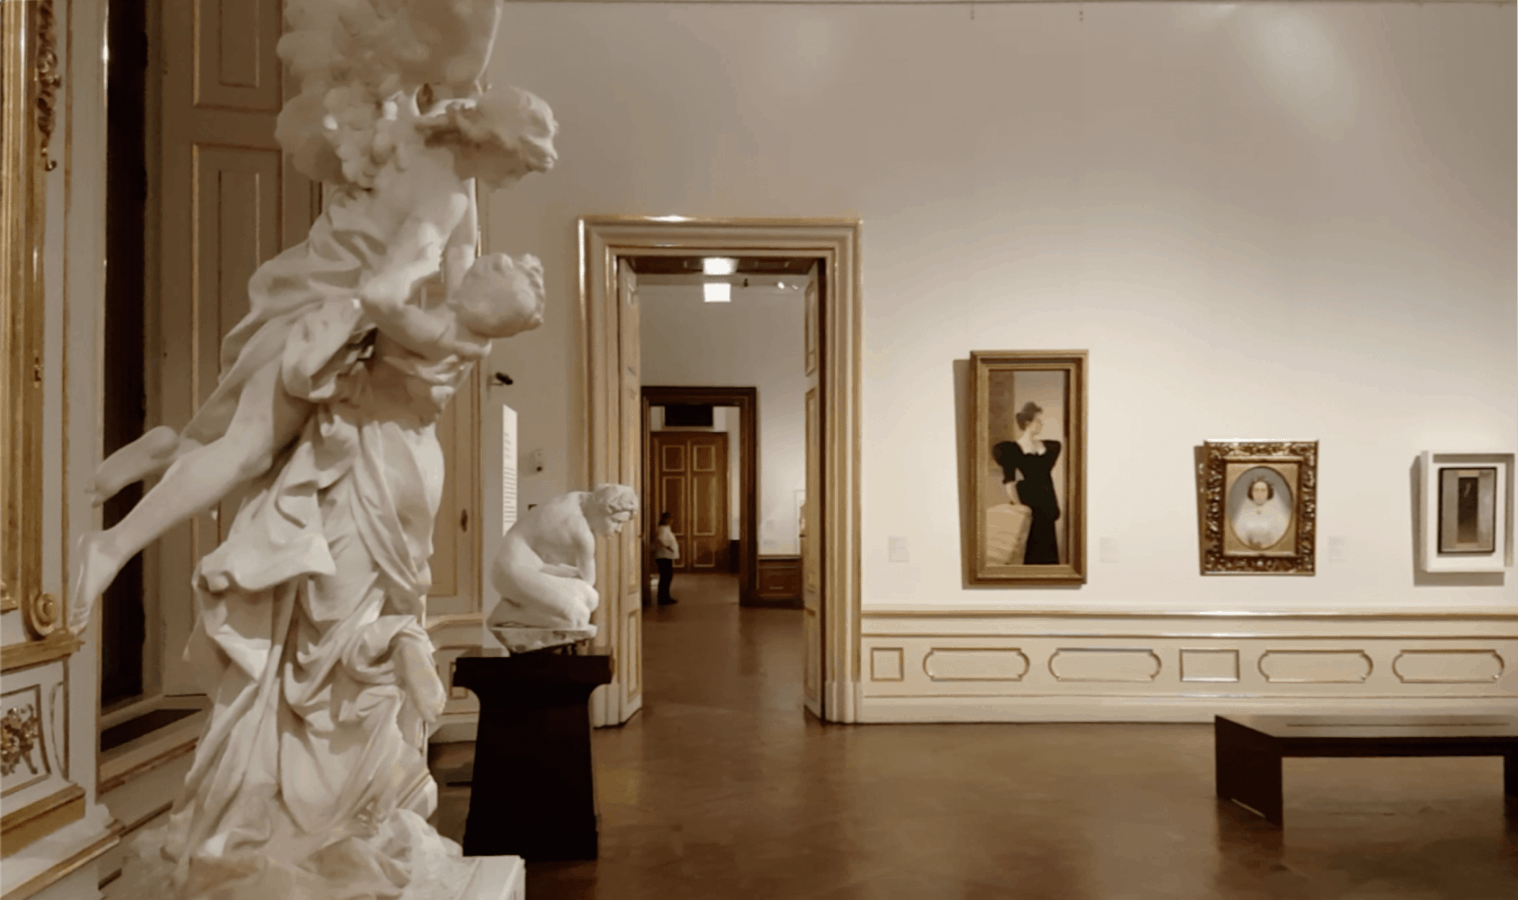 Дворец Верхний Бельведер. Экспозиция искусства Модерна. Фото: Art with me! e.U., 2019